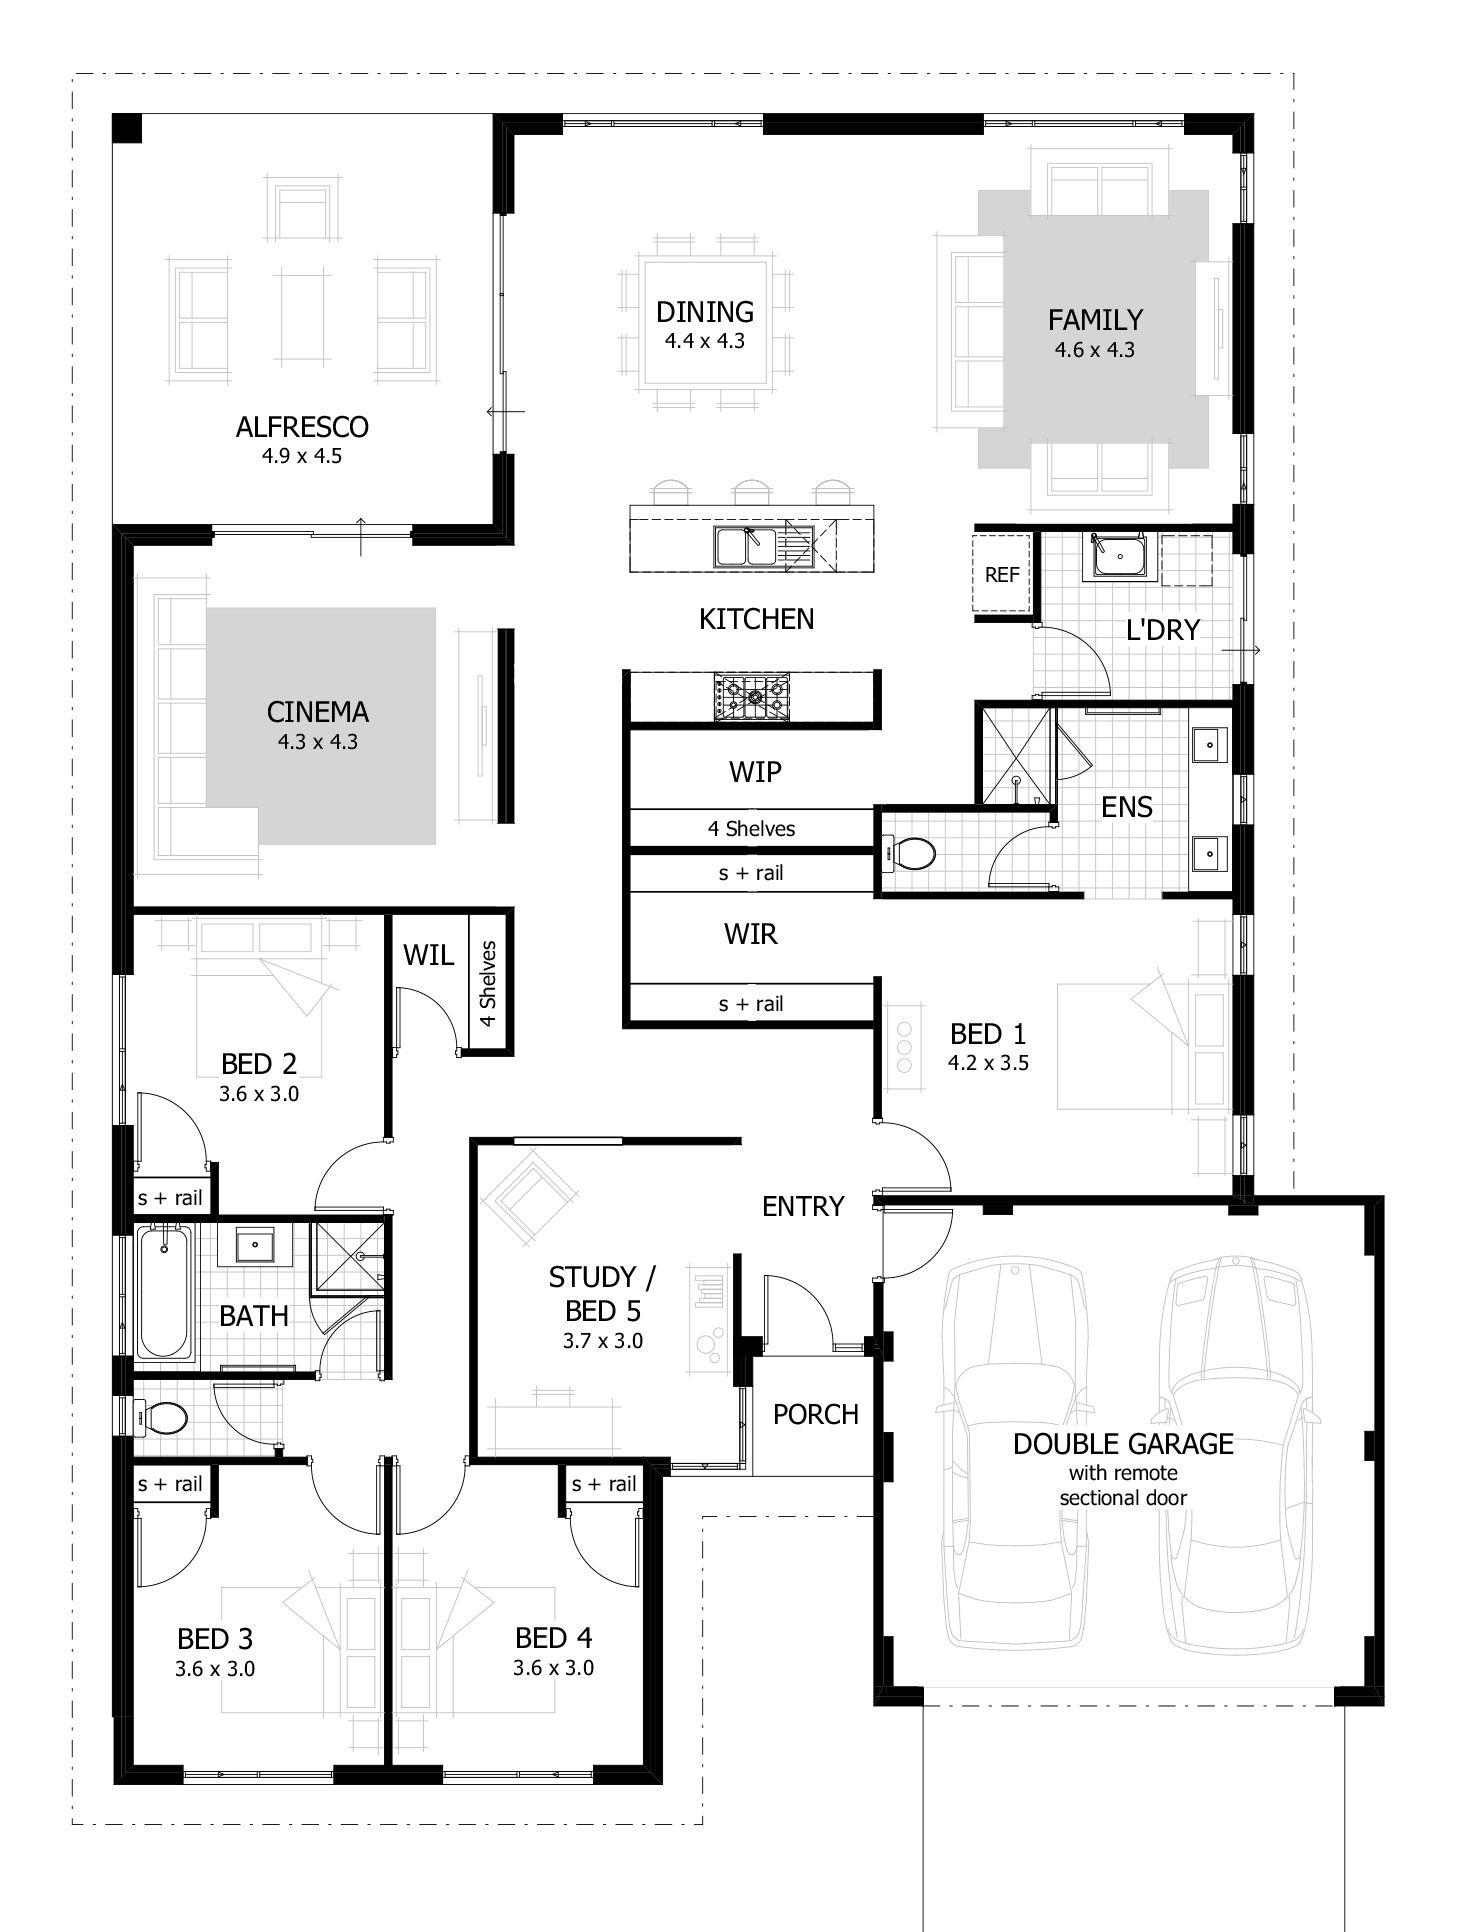 Jonat 4 Bedroom House Plan In Ghana 4 Bedroom House Plans Bedroom House Plans Four Bedroom House Plans